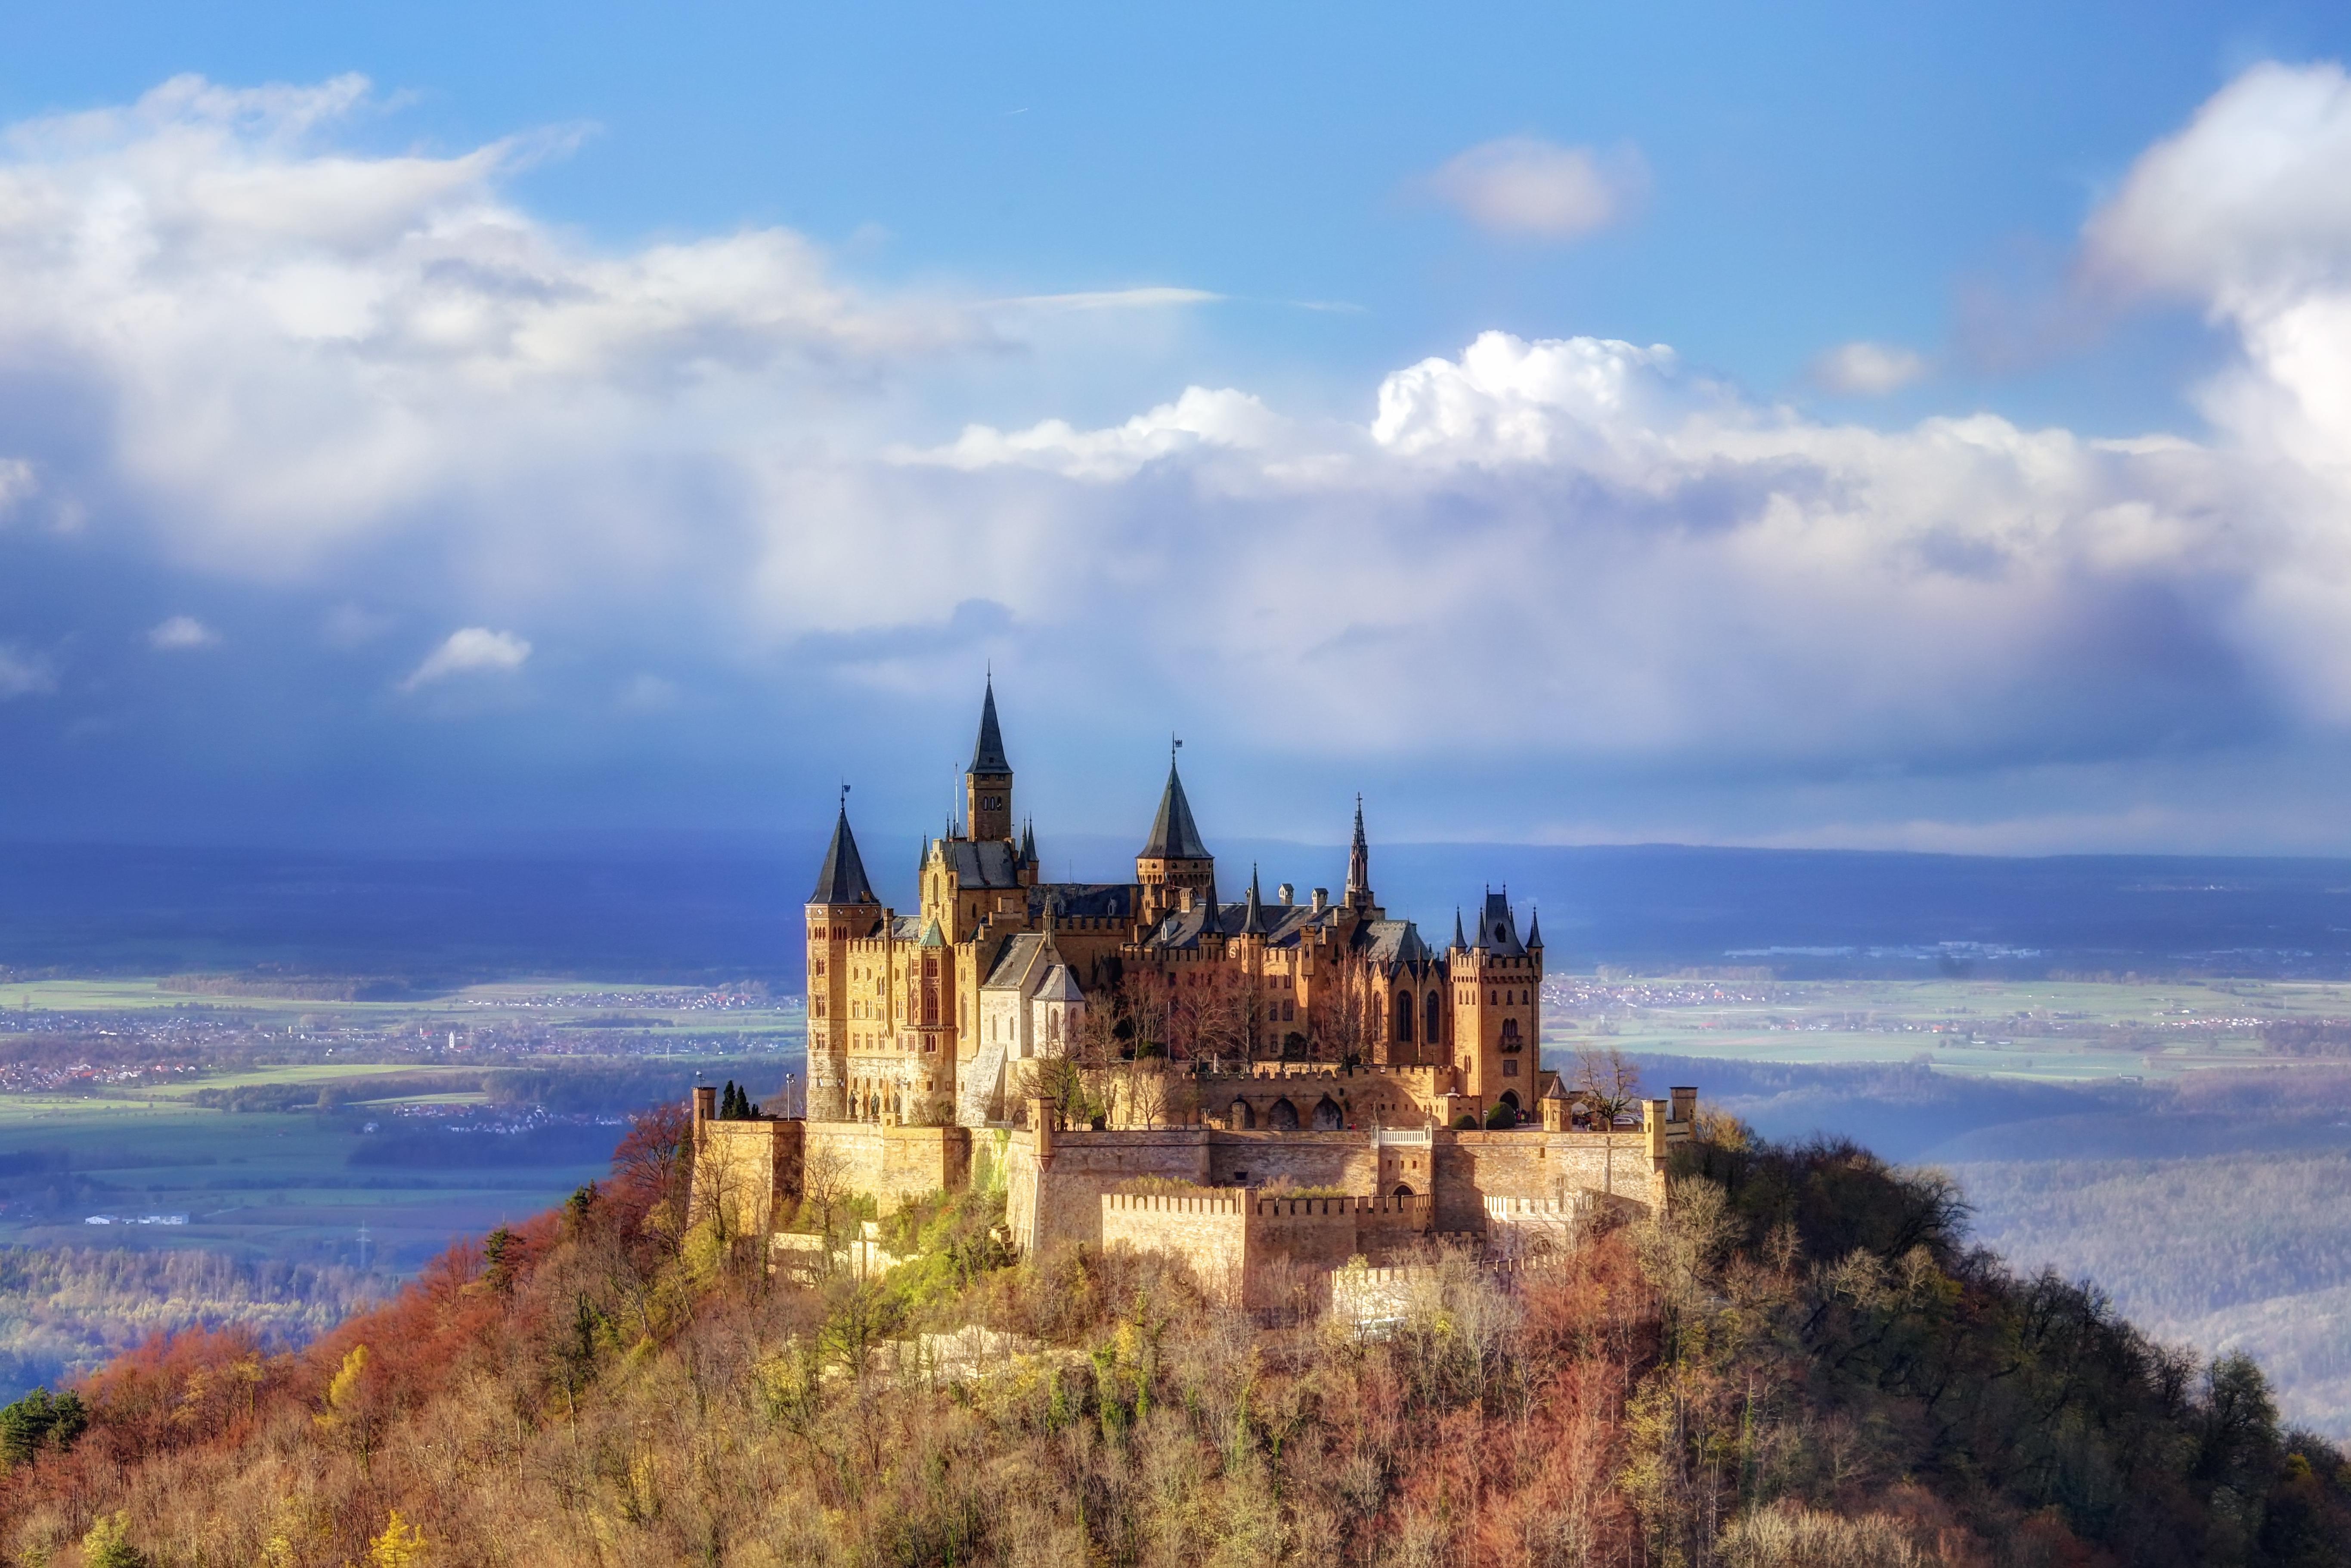 Burg Hohenzollern 4k Ultra HD Wallpaper Background Image 5461x3643 5461x3643